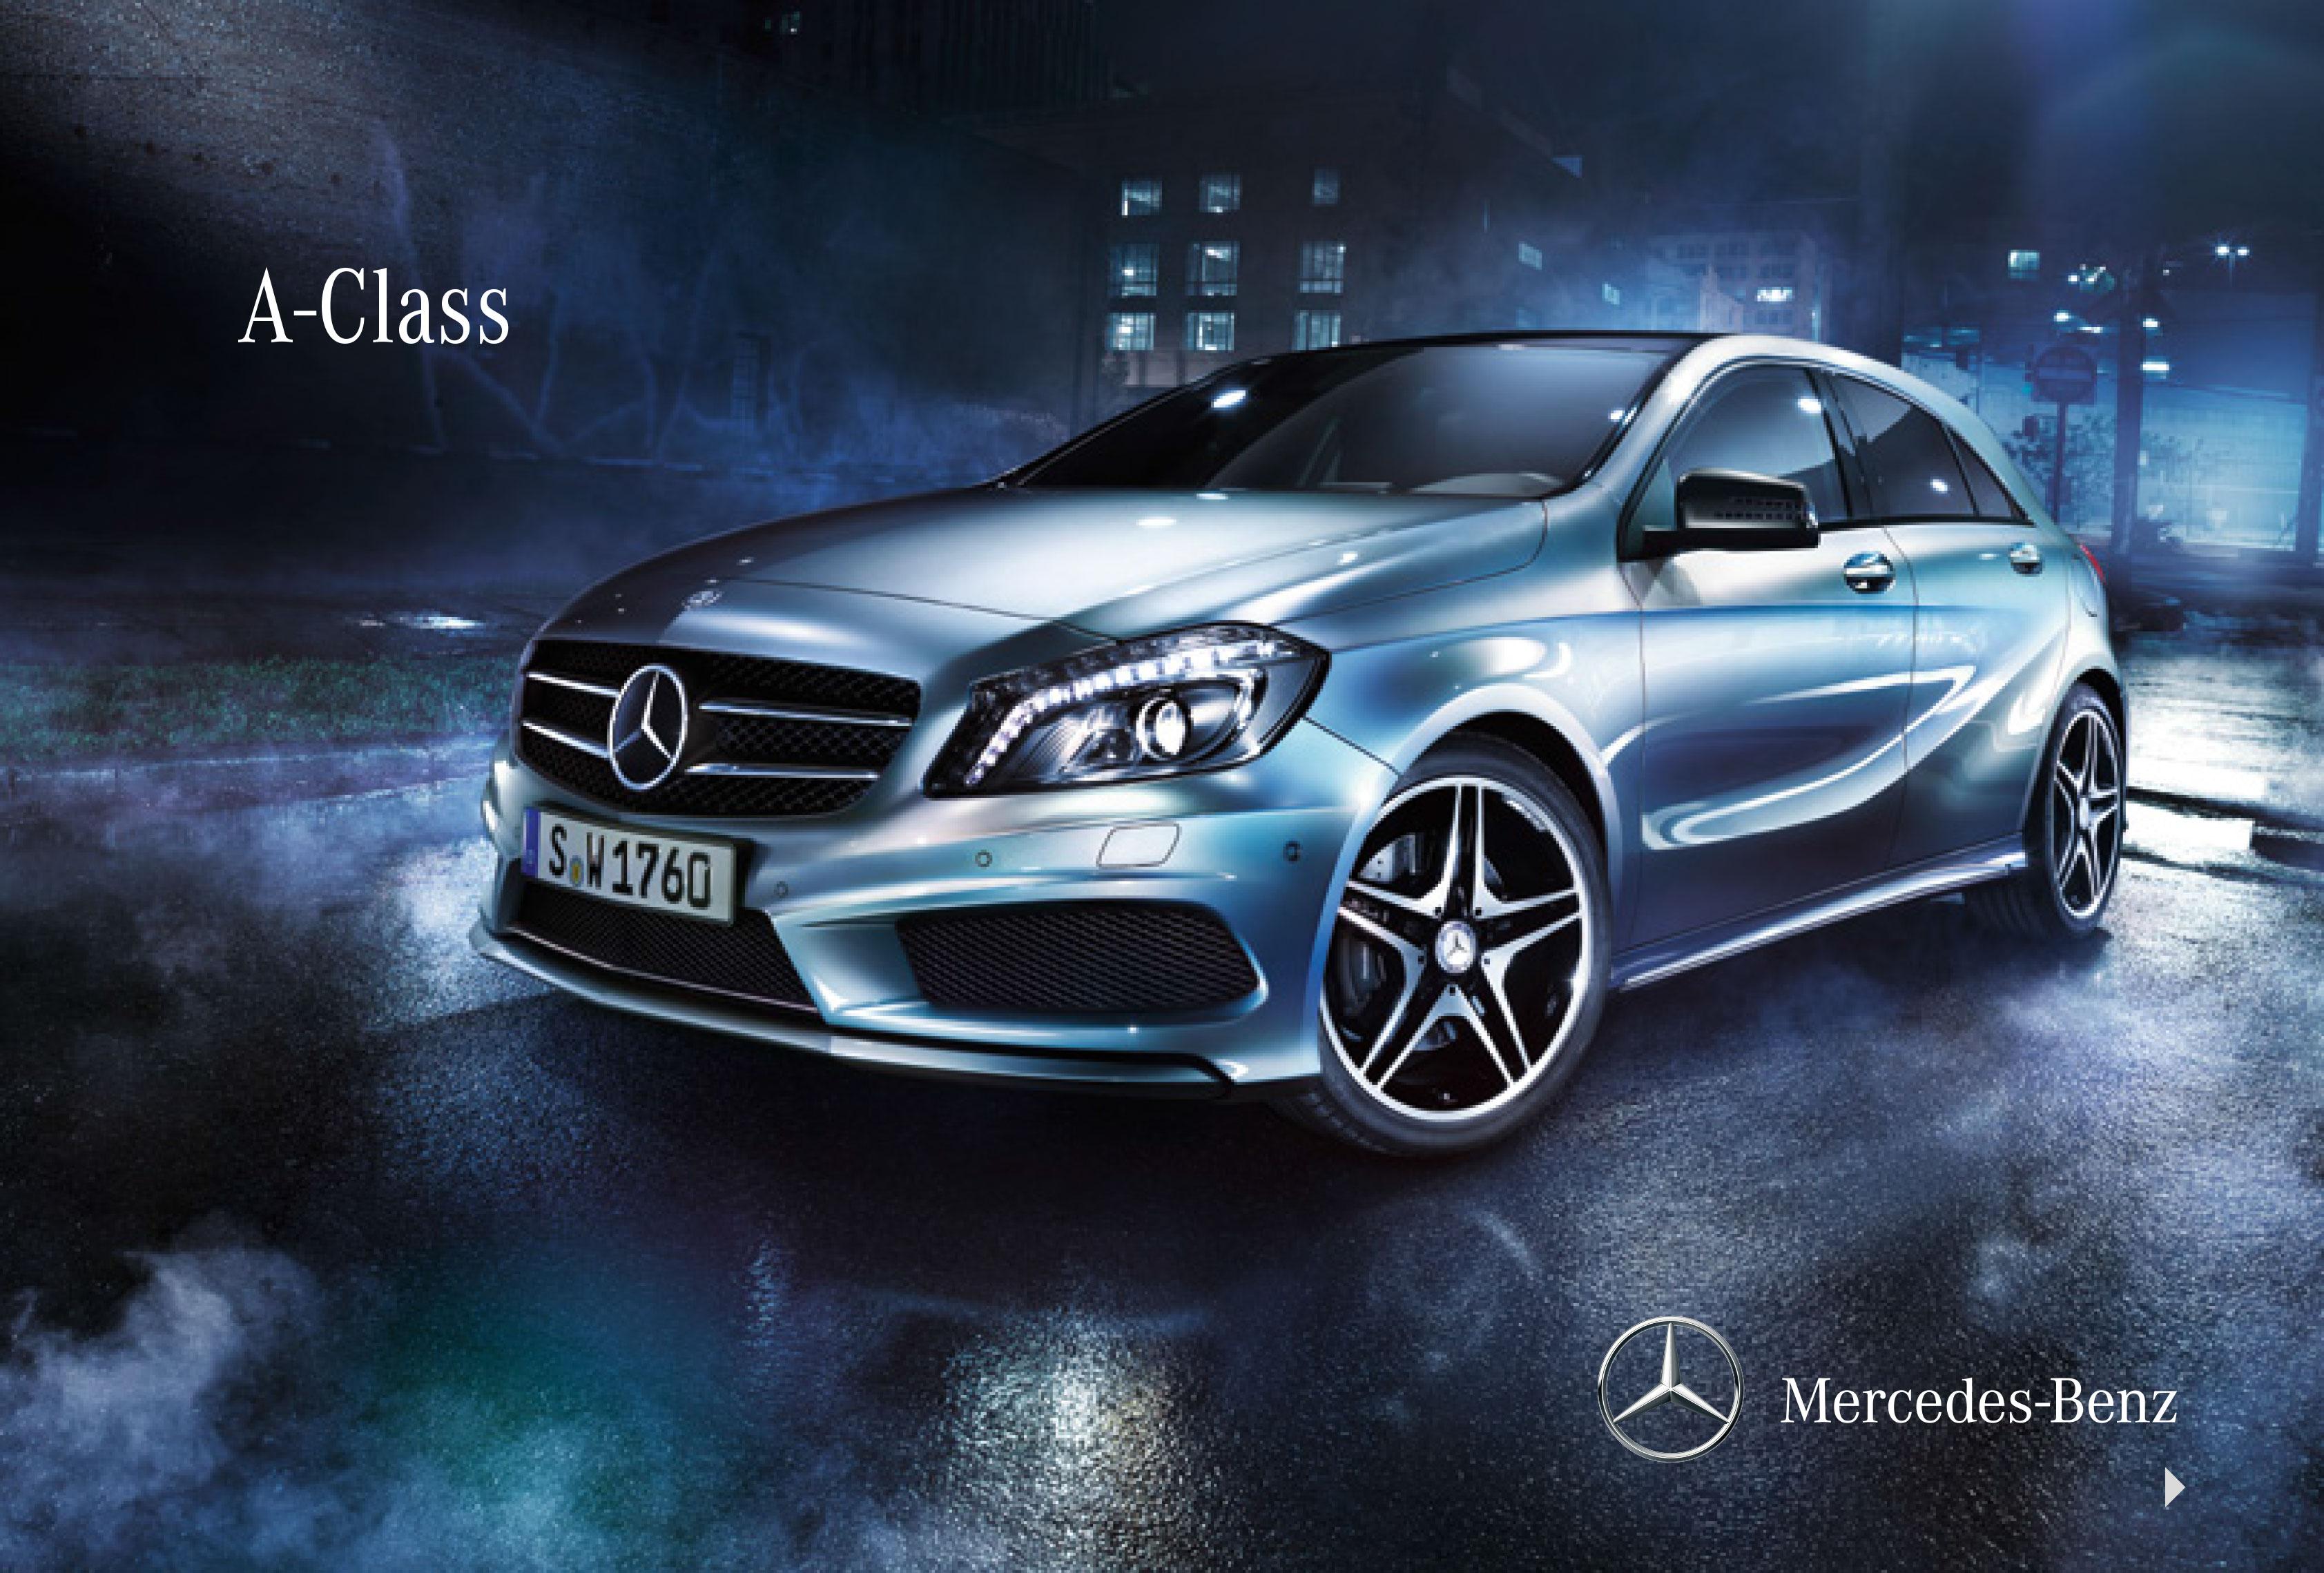 Mercedes a class brochure